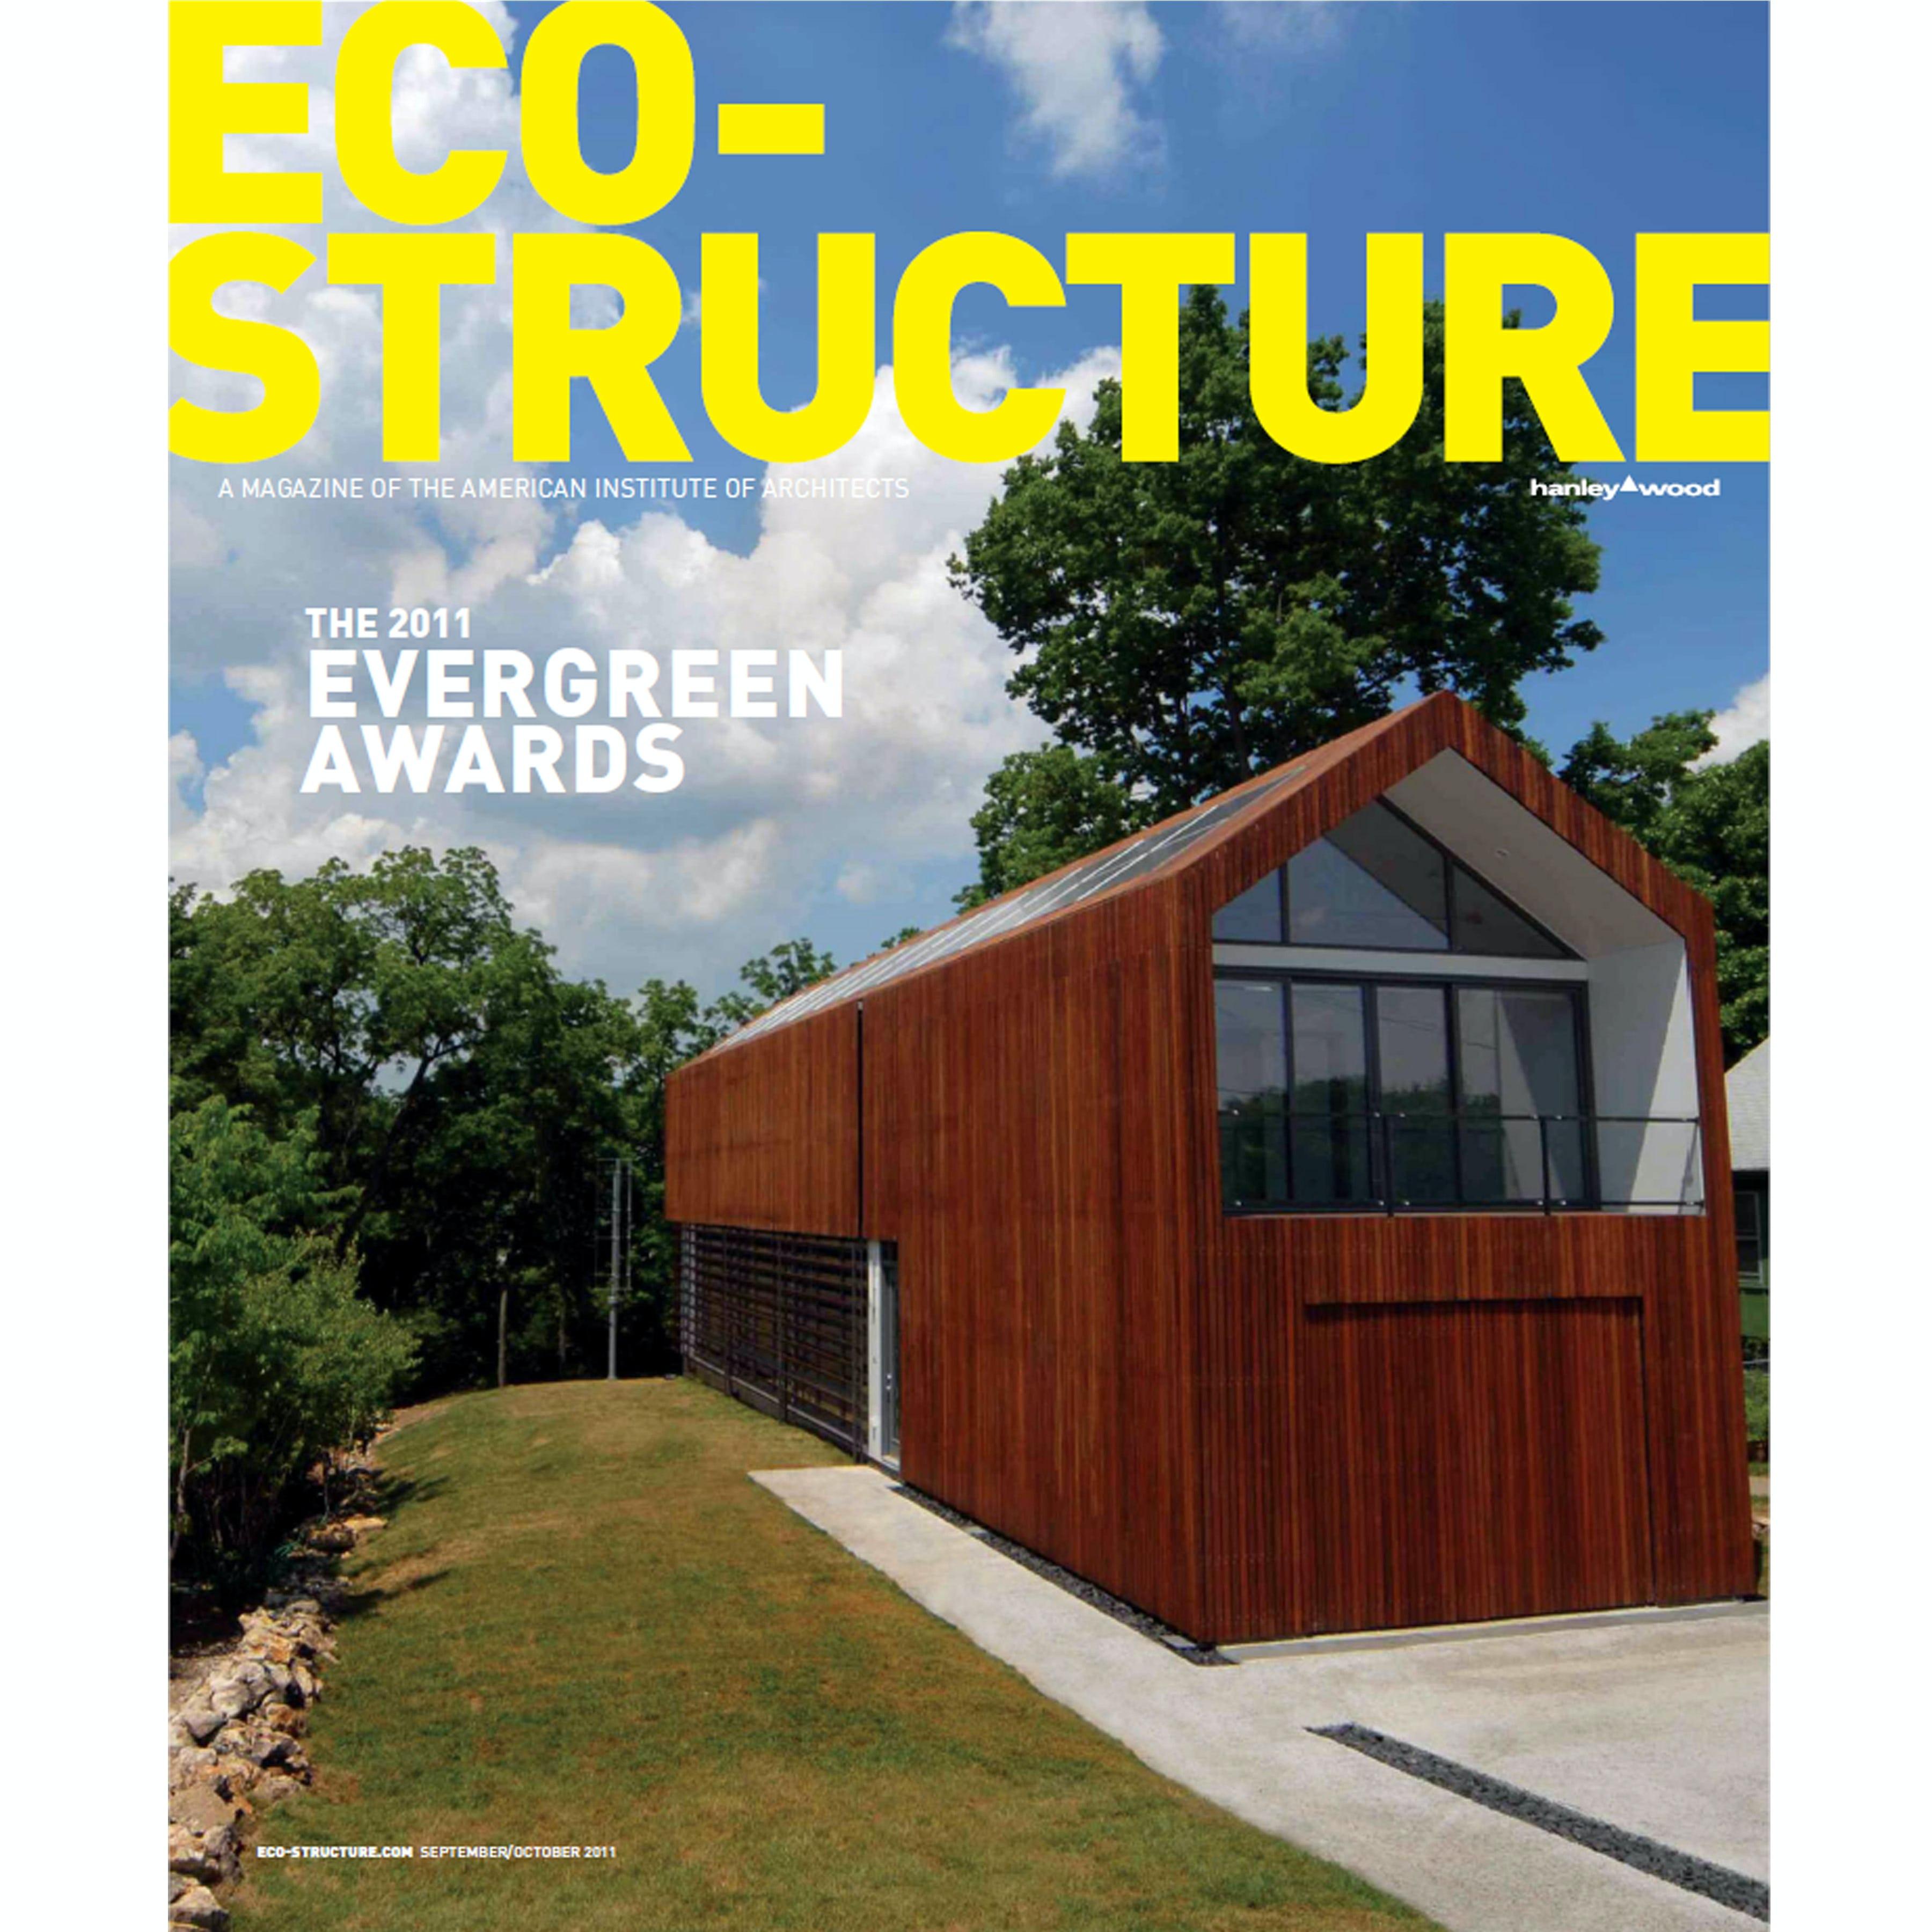 Rvtr eco structure oct 11